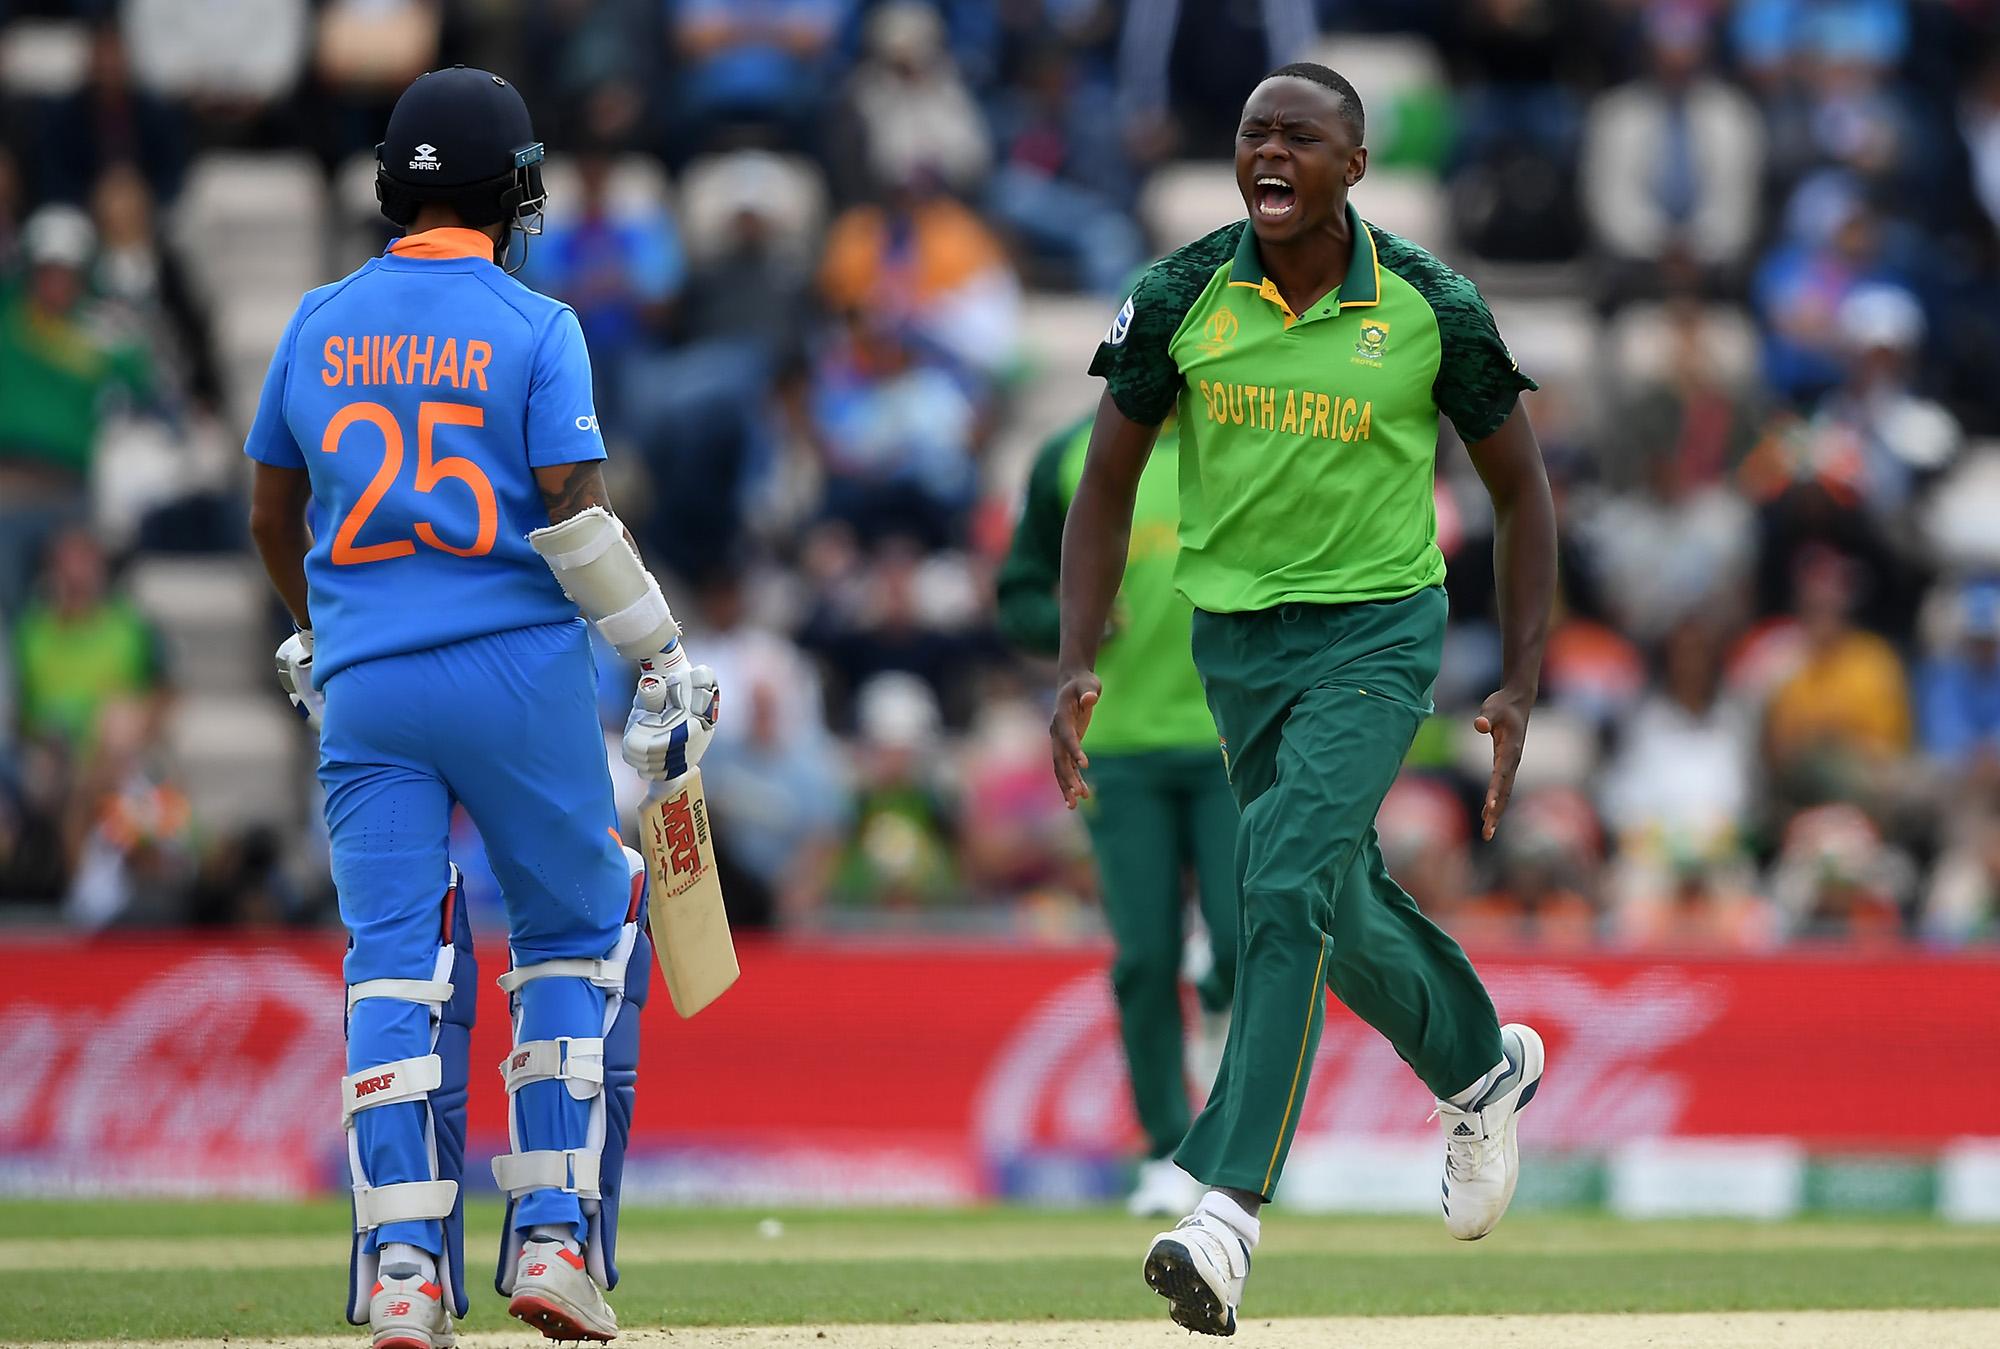 Proteas vs England: Straight-talking Rabada keeps the spotlight off cricket for now - Daily Maverick